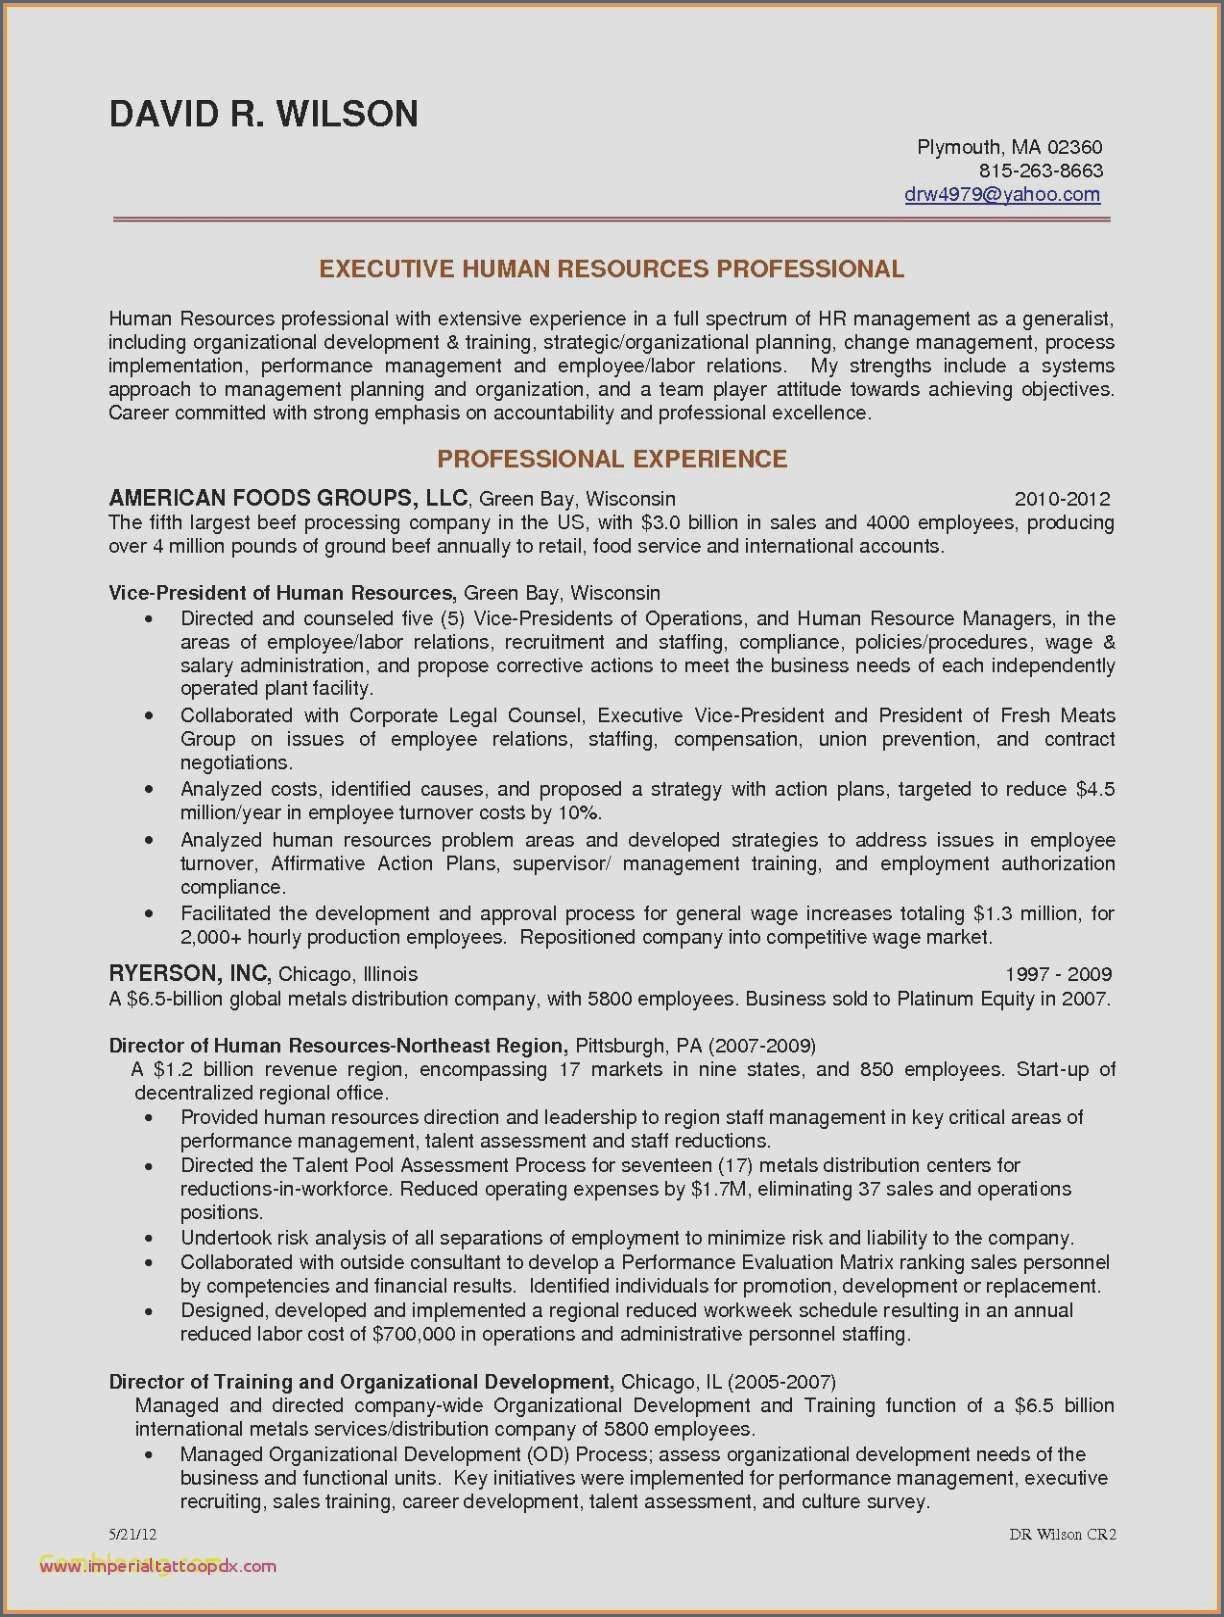 Unit Trust Distribution Statement Template